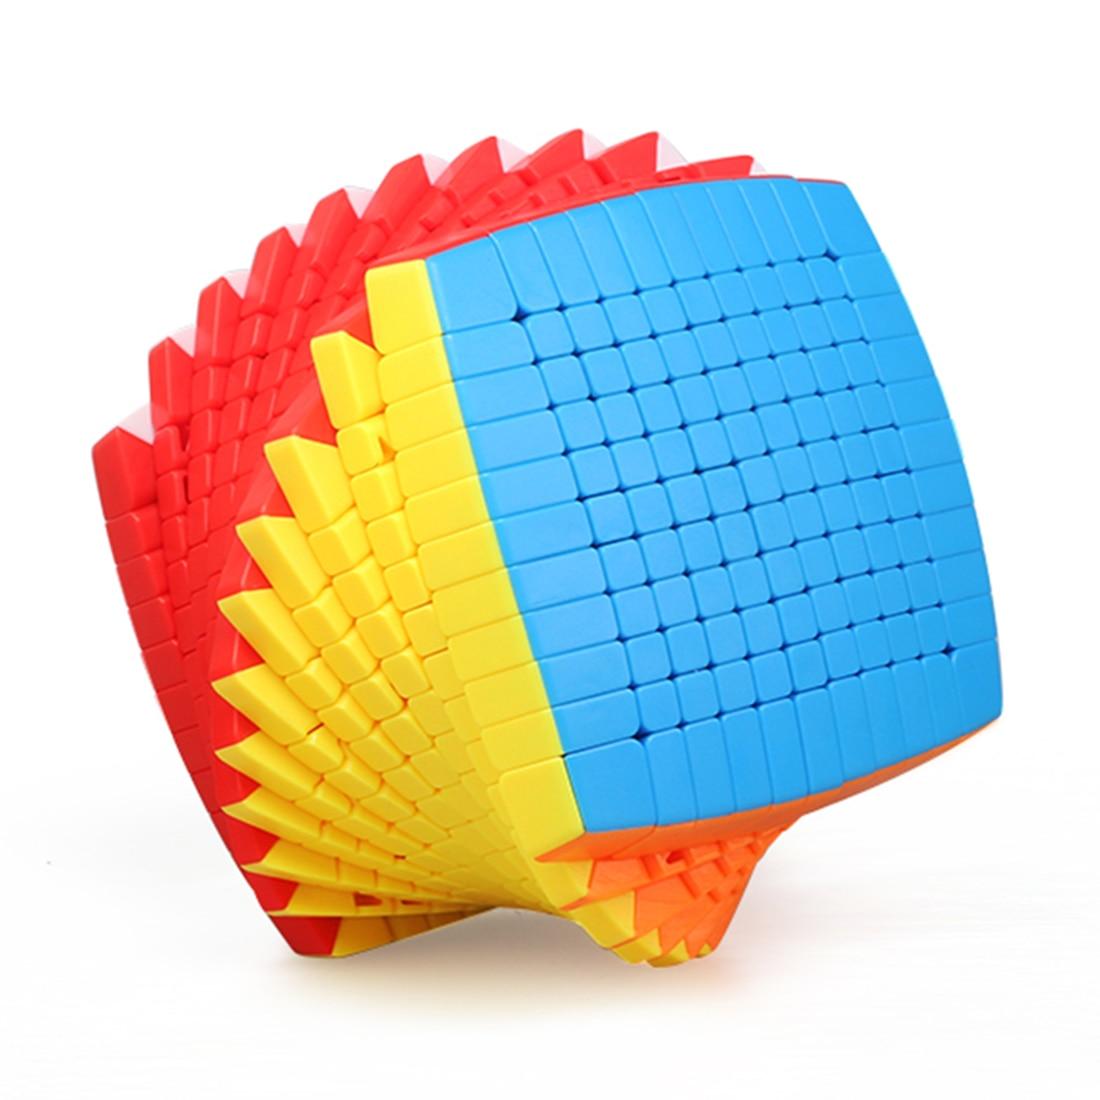 Shengshou 10X10 / 11X11/ 12X12 /13X13 / 14X14 /15X15 Magic Cube Professional Speed Cubes Adults Kids Christmas Gifts 2019